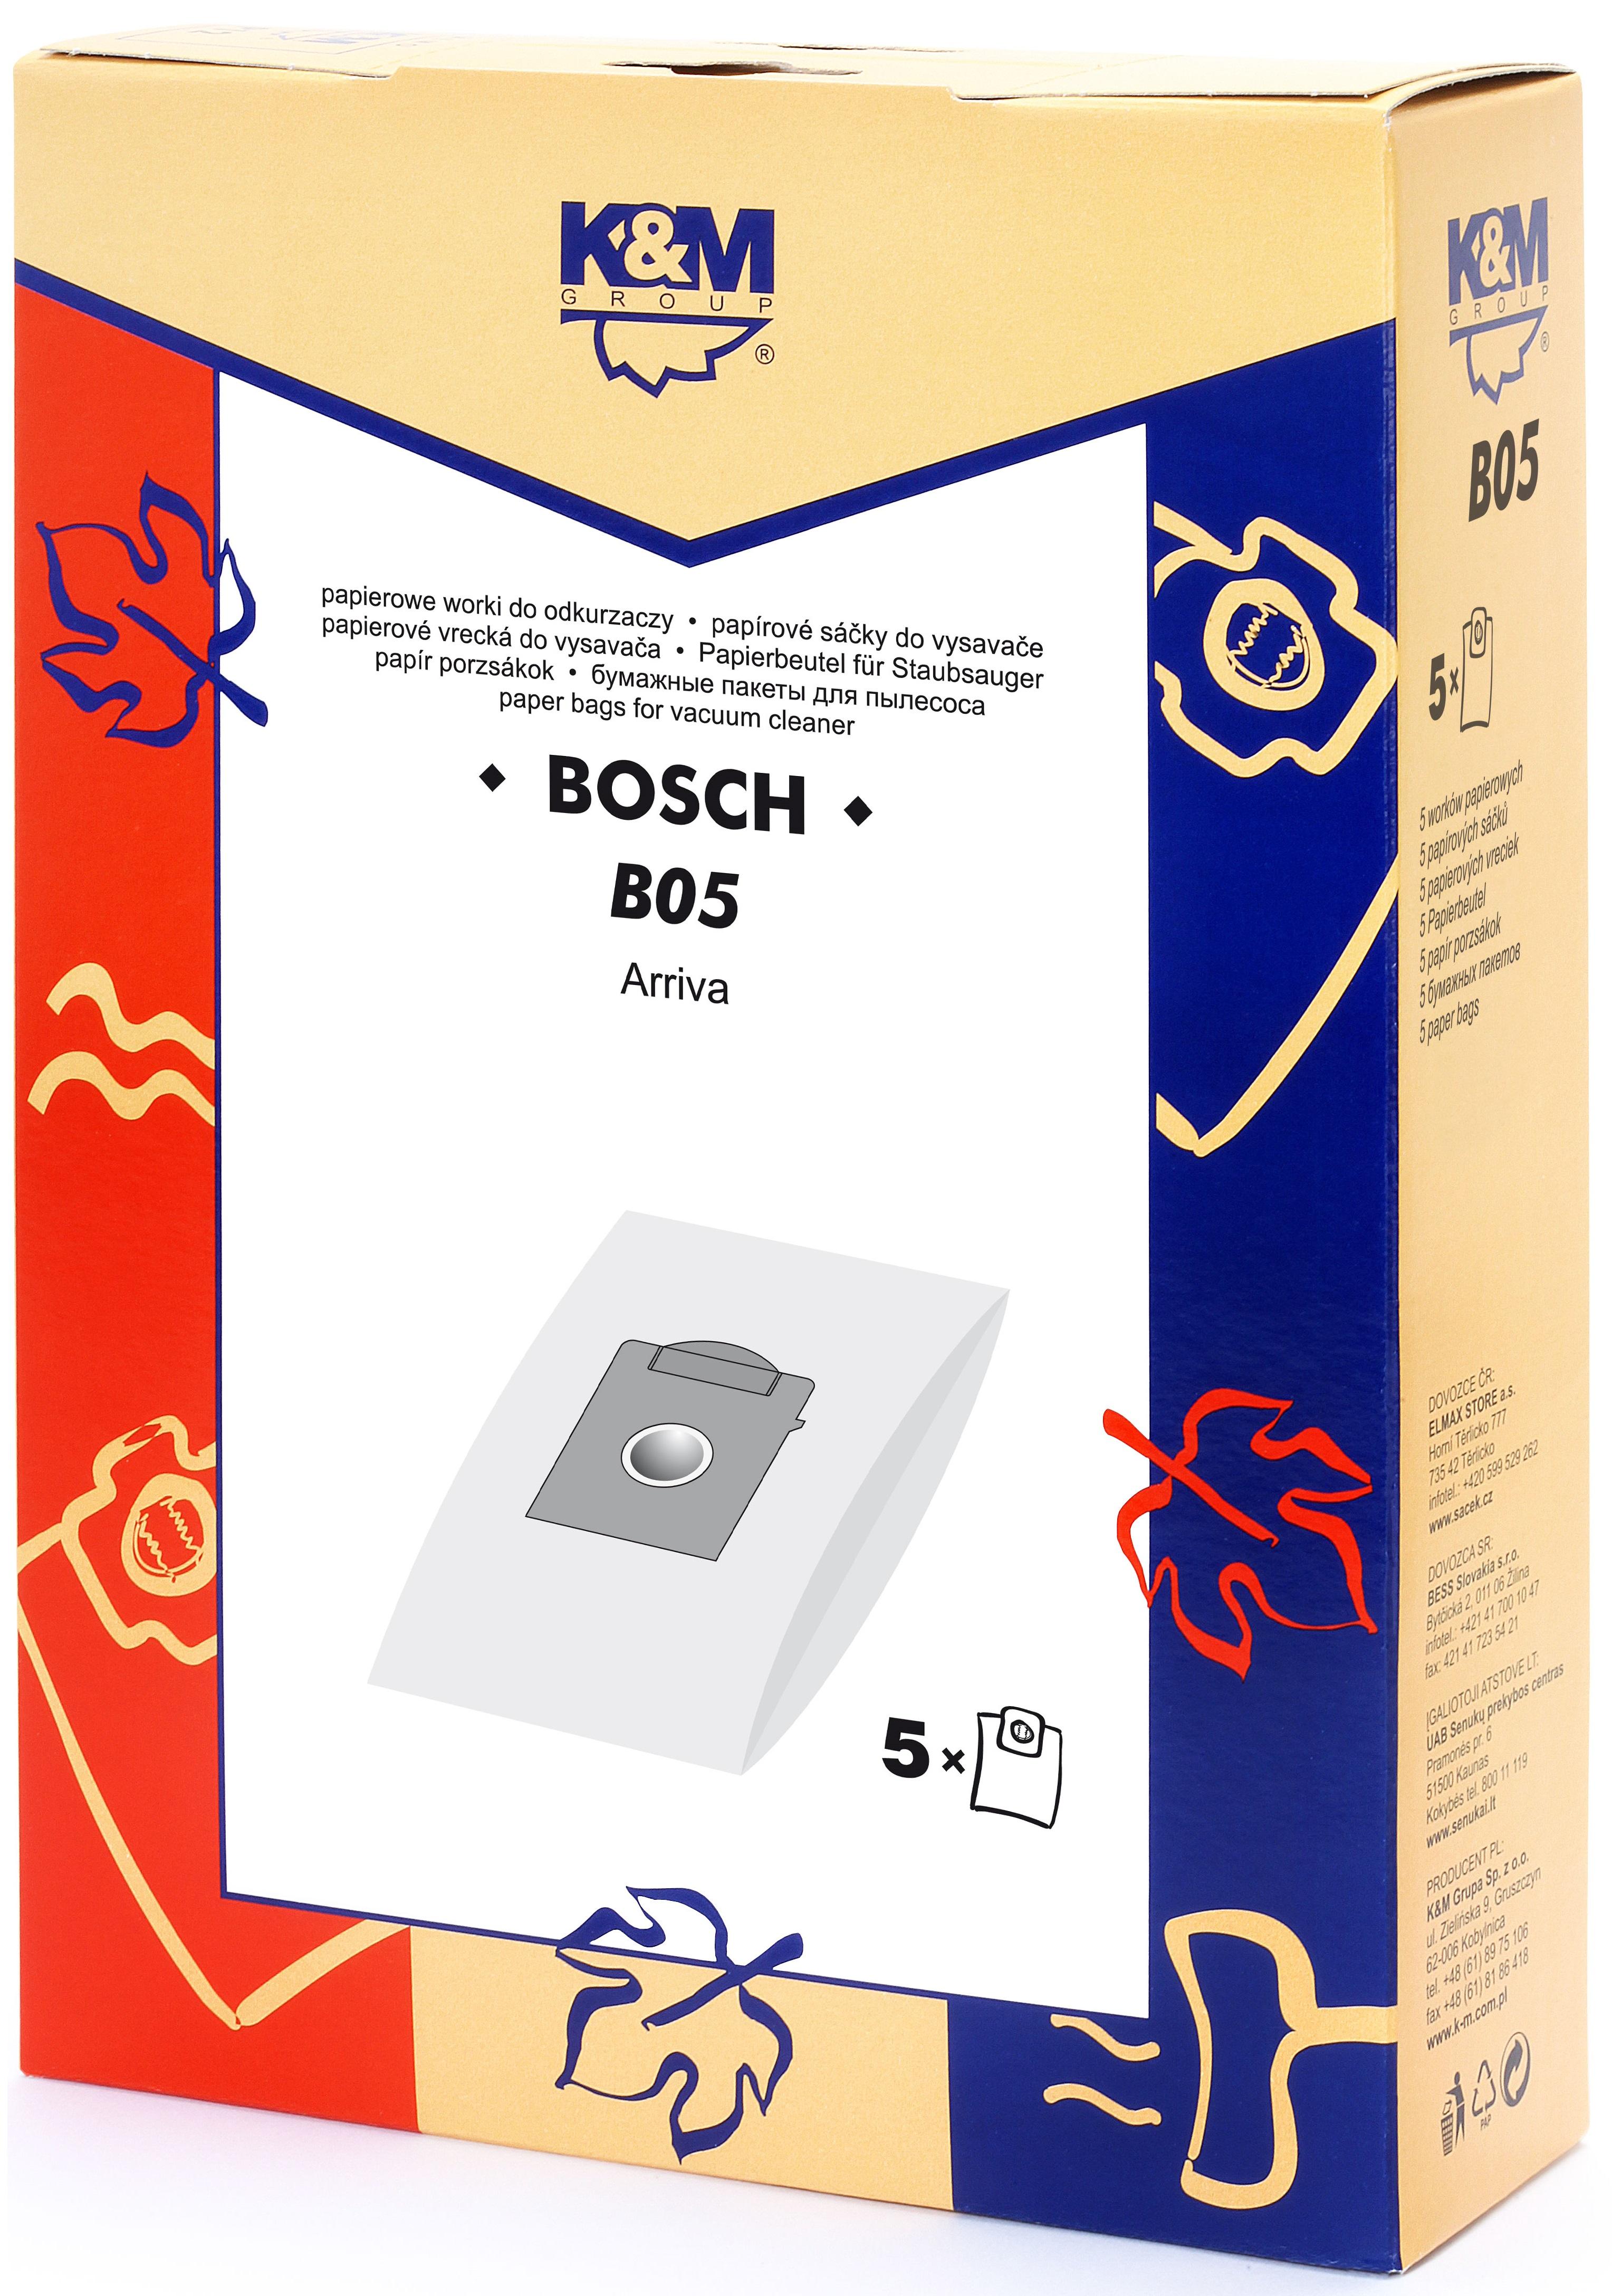 Sac aspirator pentru Bosch/Siemens typ K, hartie, 5X saci, K&M 0